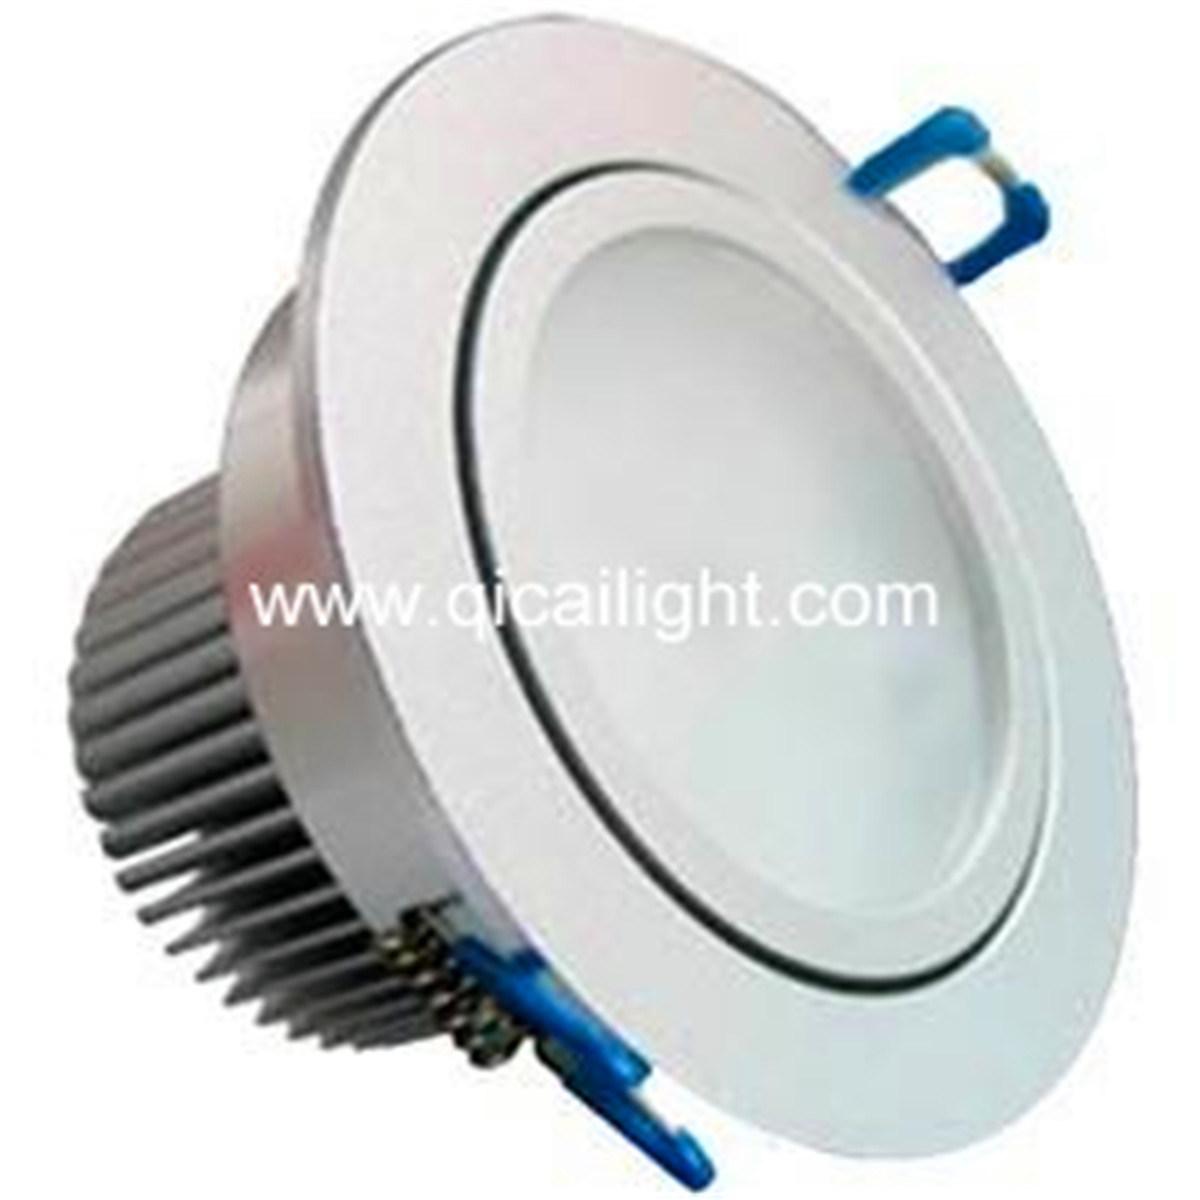 7X1W High Power LED Downlight (QC-DL-7X1W-95mm-B9)